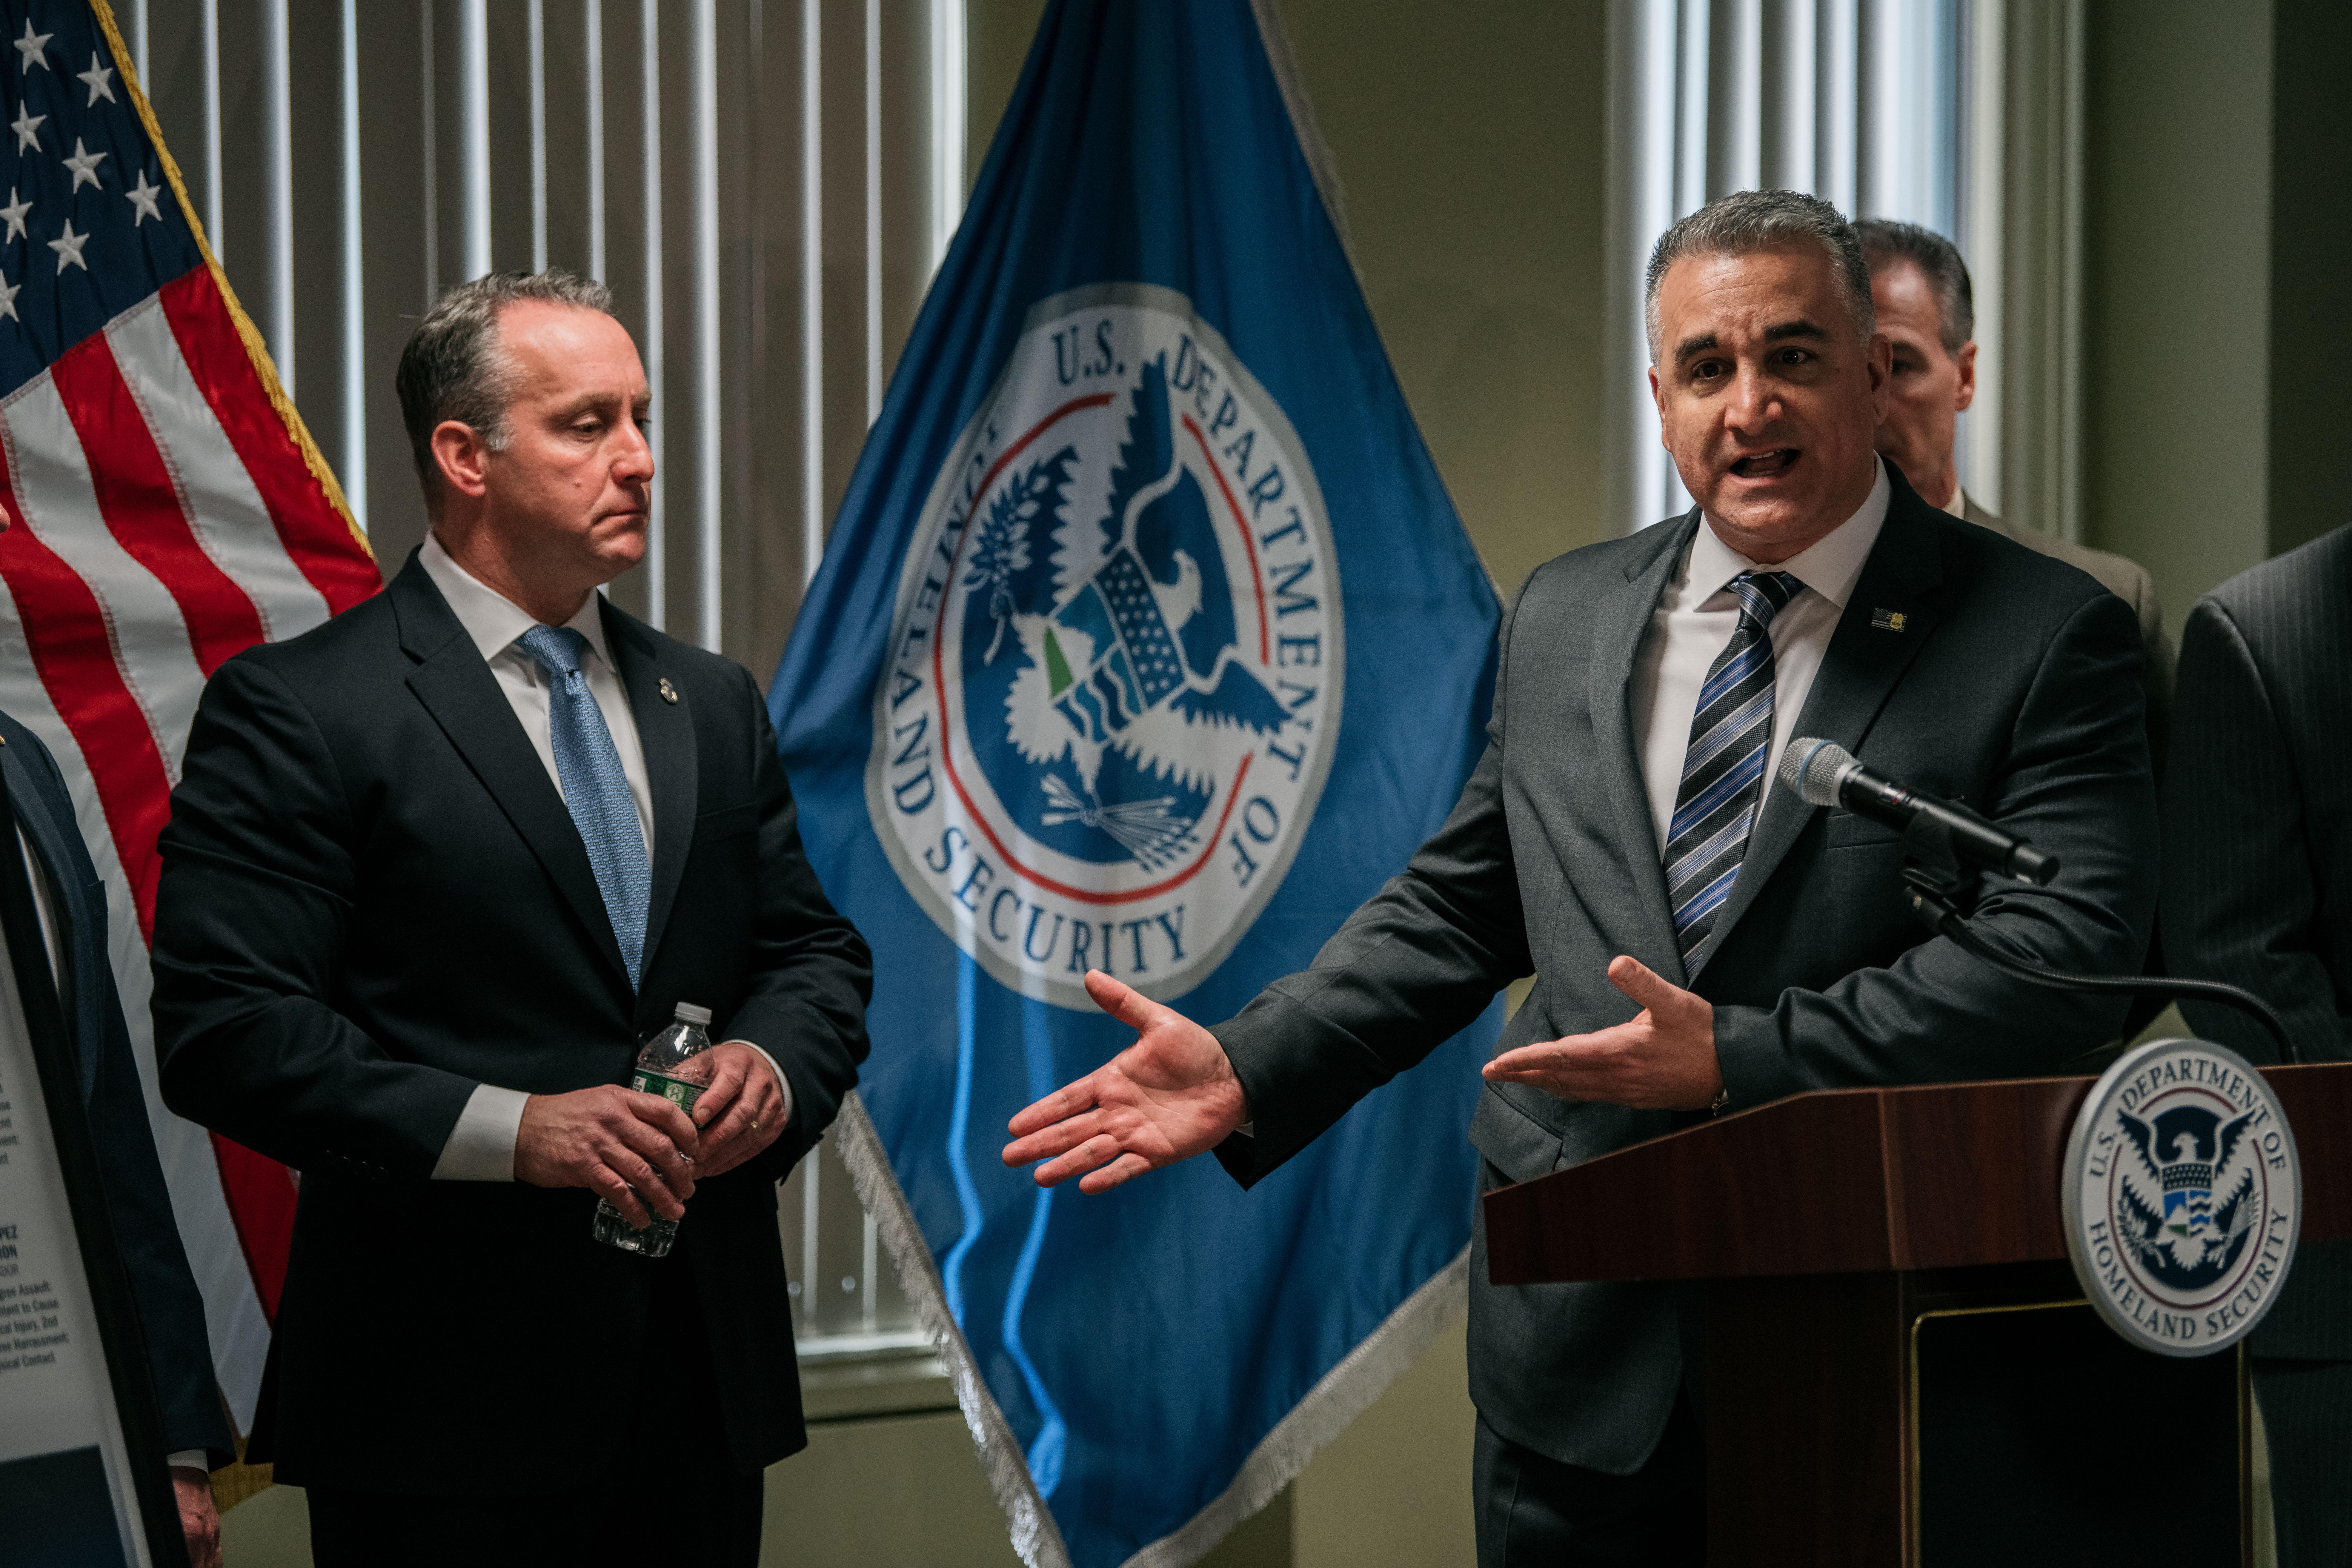 Immigration And Customs Enforcement Acting Director Matthew Albence Speak On Sanctuary Policies